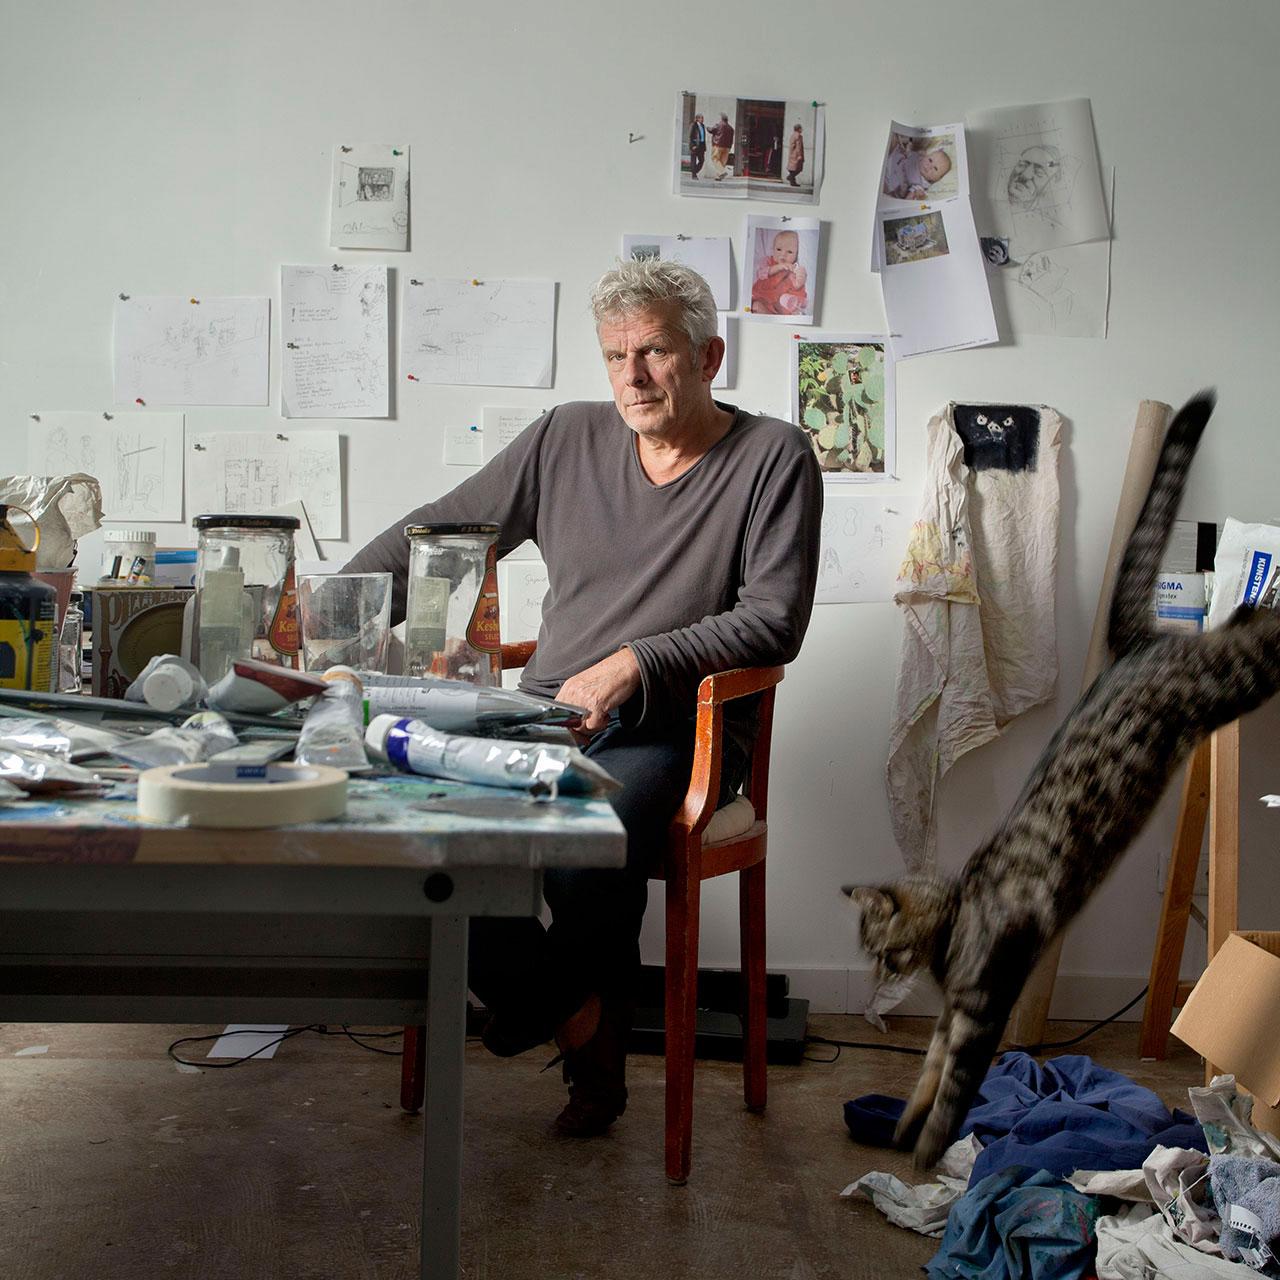 Alex van Warmerdam